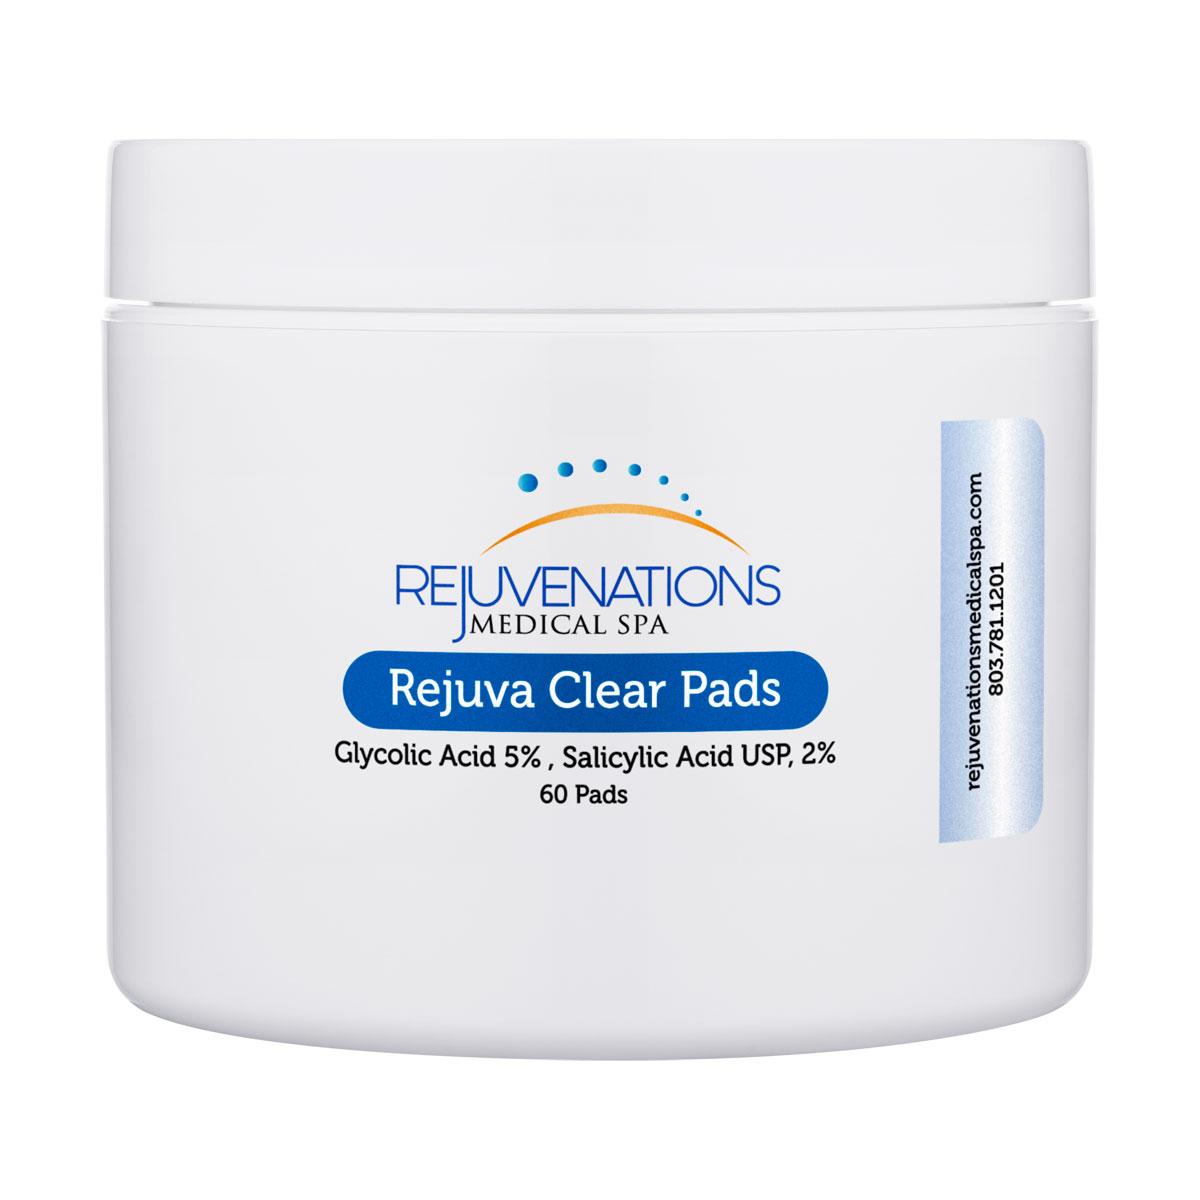 Rejuva Clear Pads